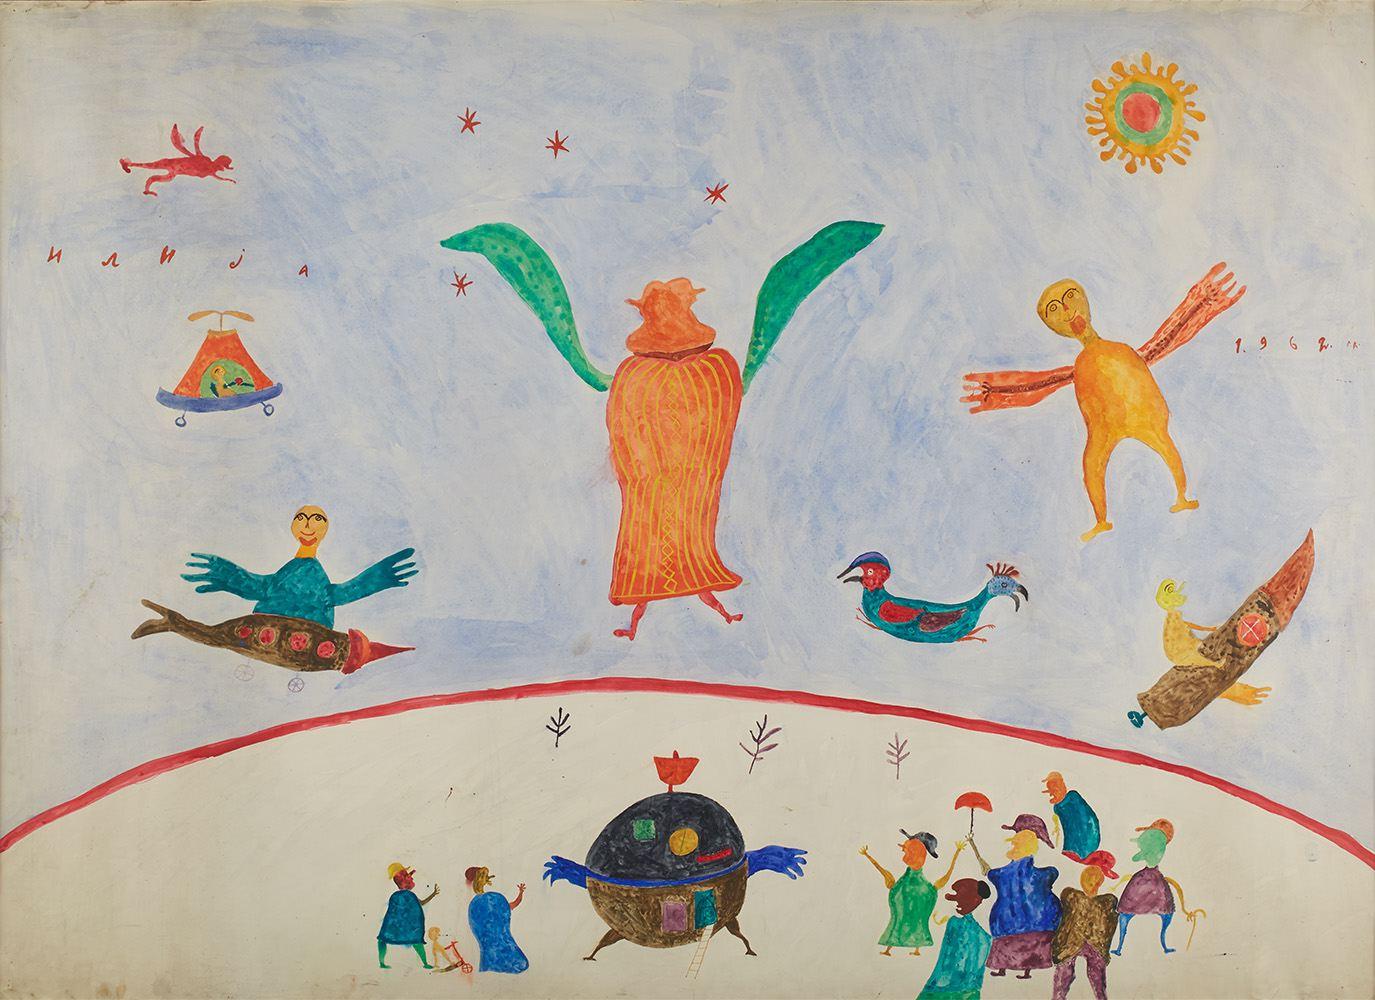 Ilija Bosilj Bašičević    Interplanetary Travelers  , 1962 Gouache on paper 42.125 x 59.125 inches 107 x 150.2 cm IBo 13